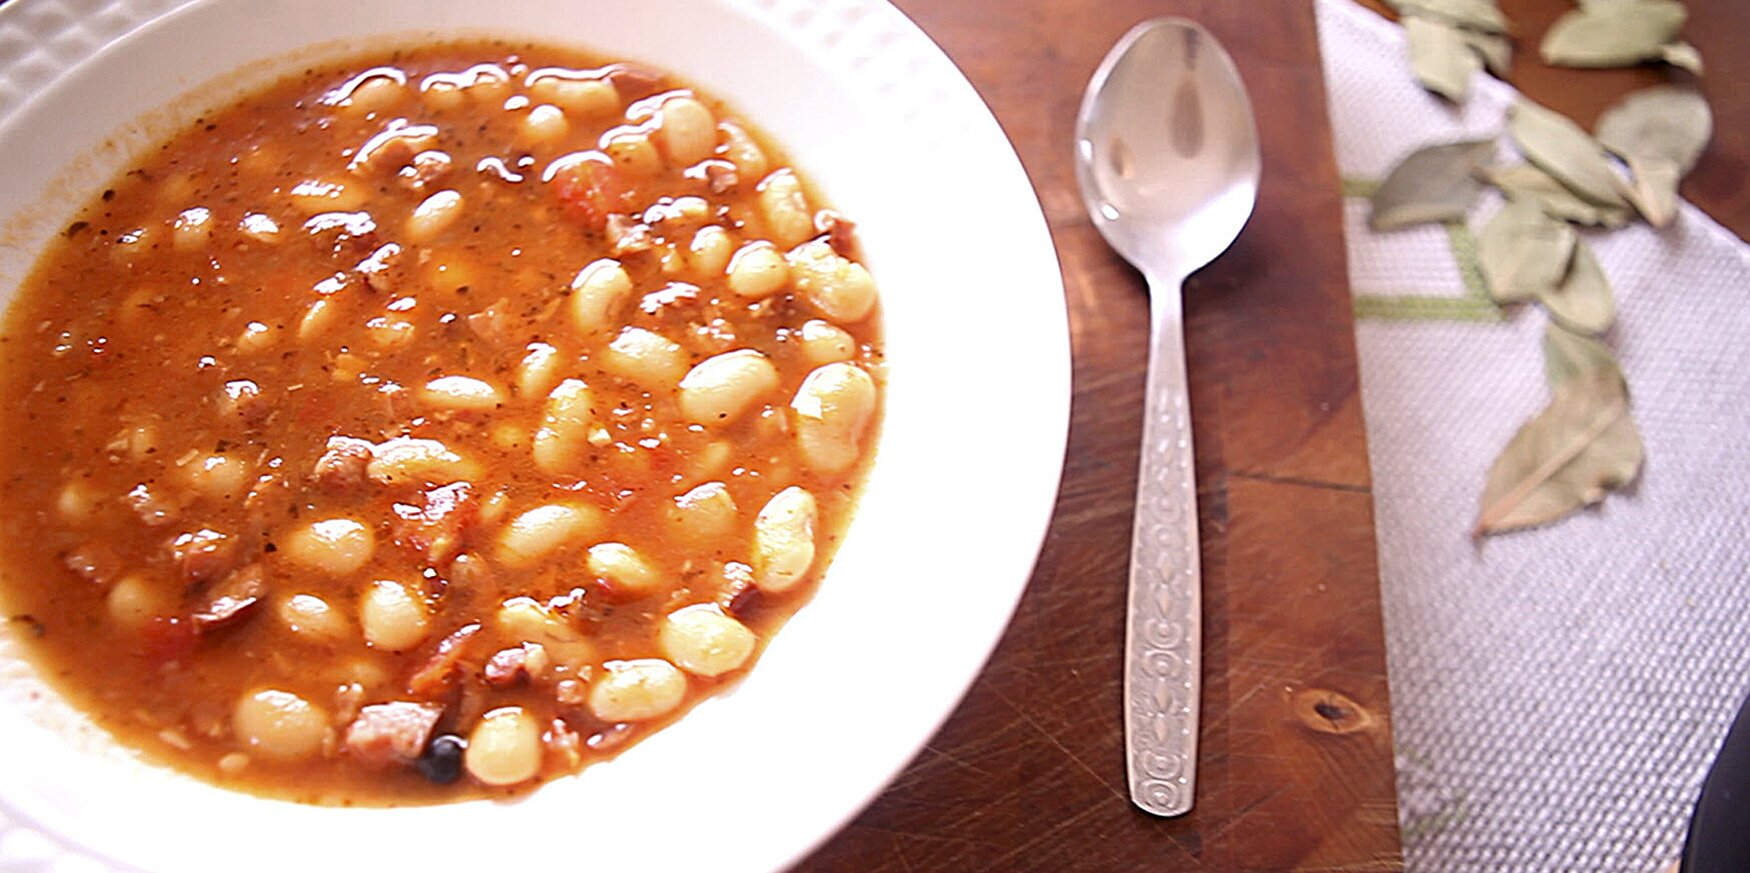 polish bean and sausage stew recipe